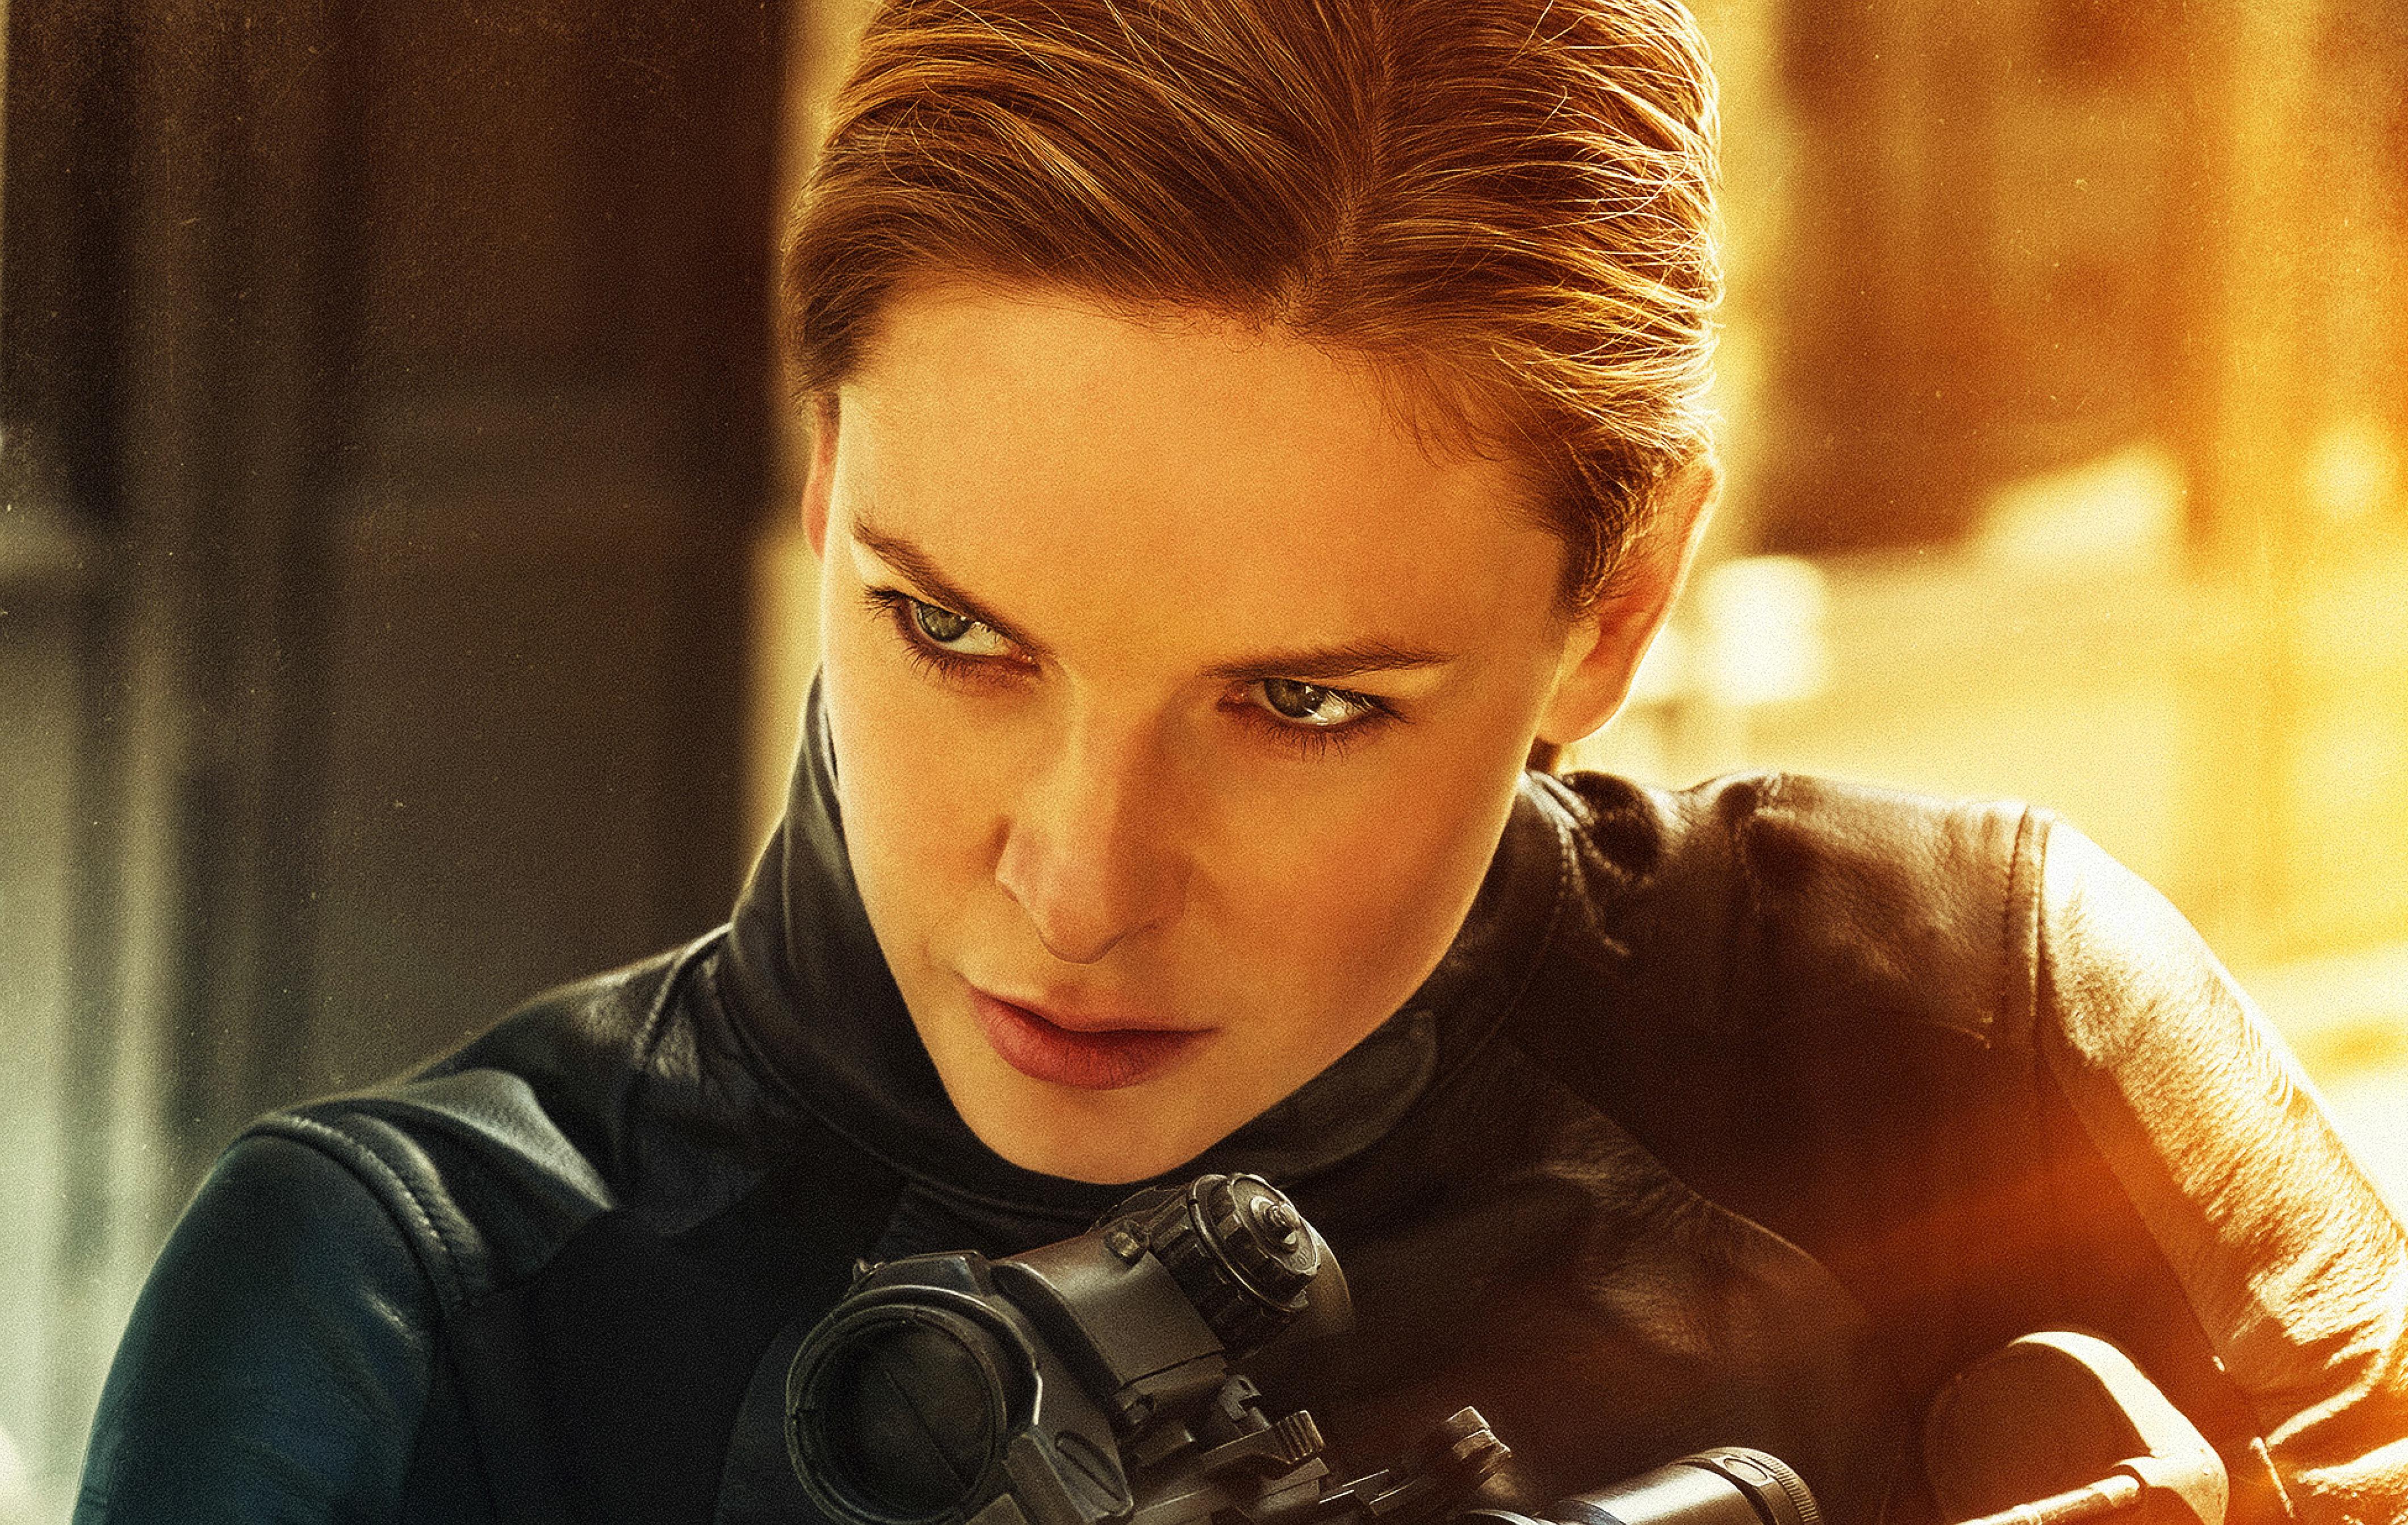 Rebecca Ferguson In Mission Impossible 6 Wallpaper Hd